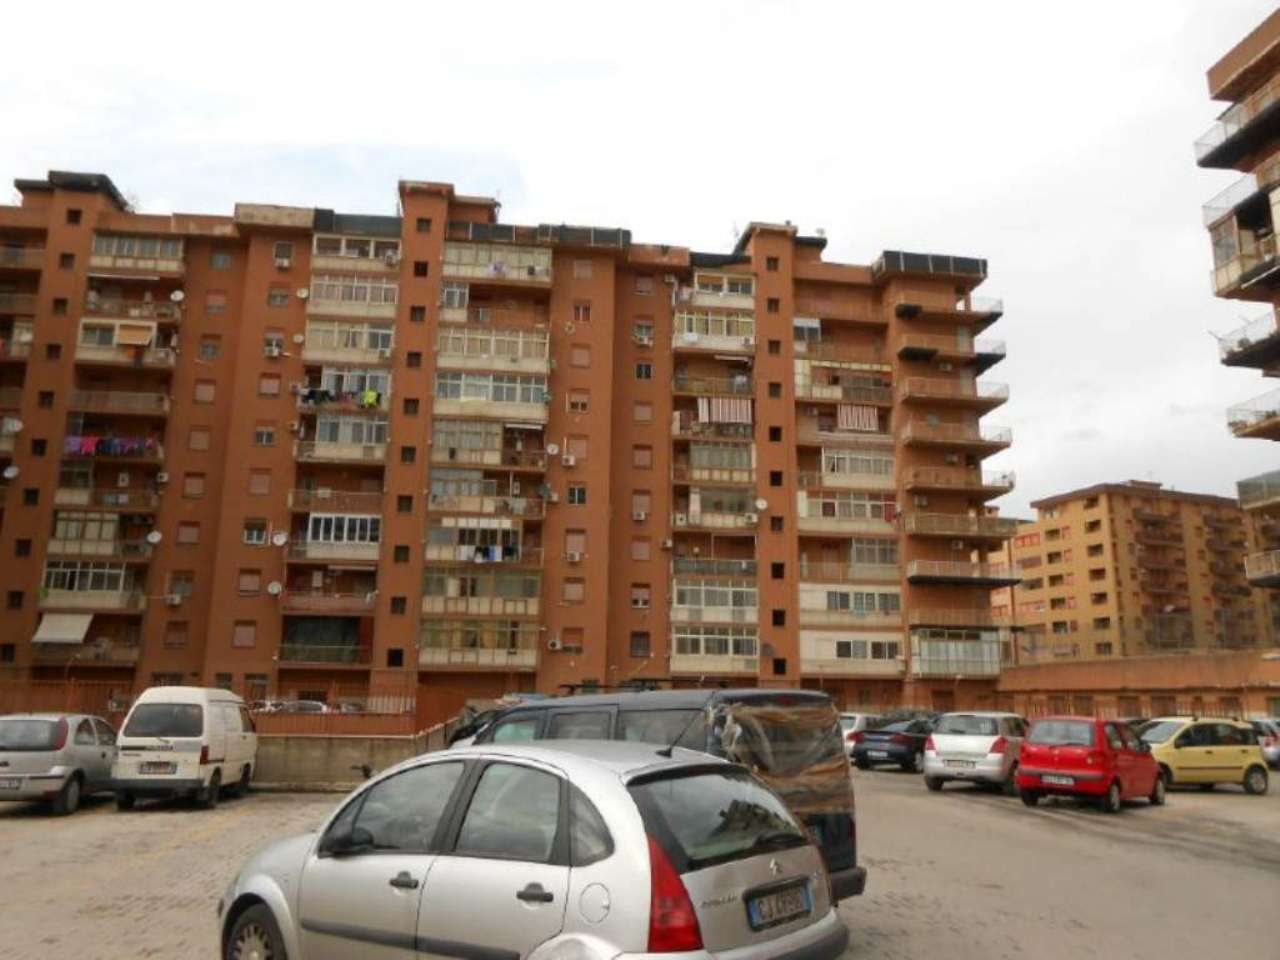 Bilocale Palermo Largo Os 2 8